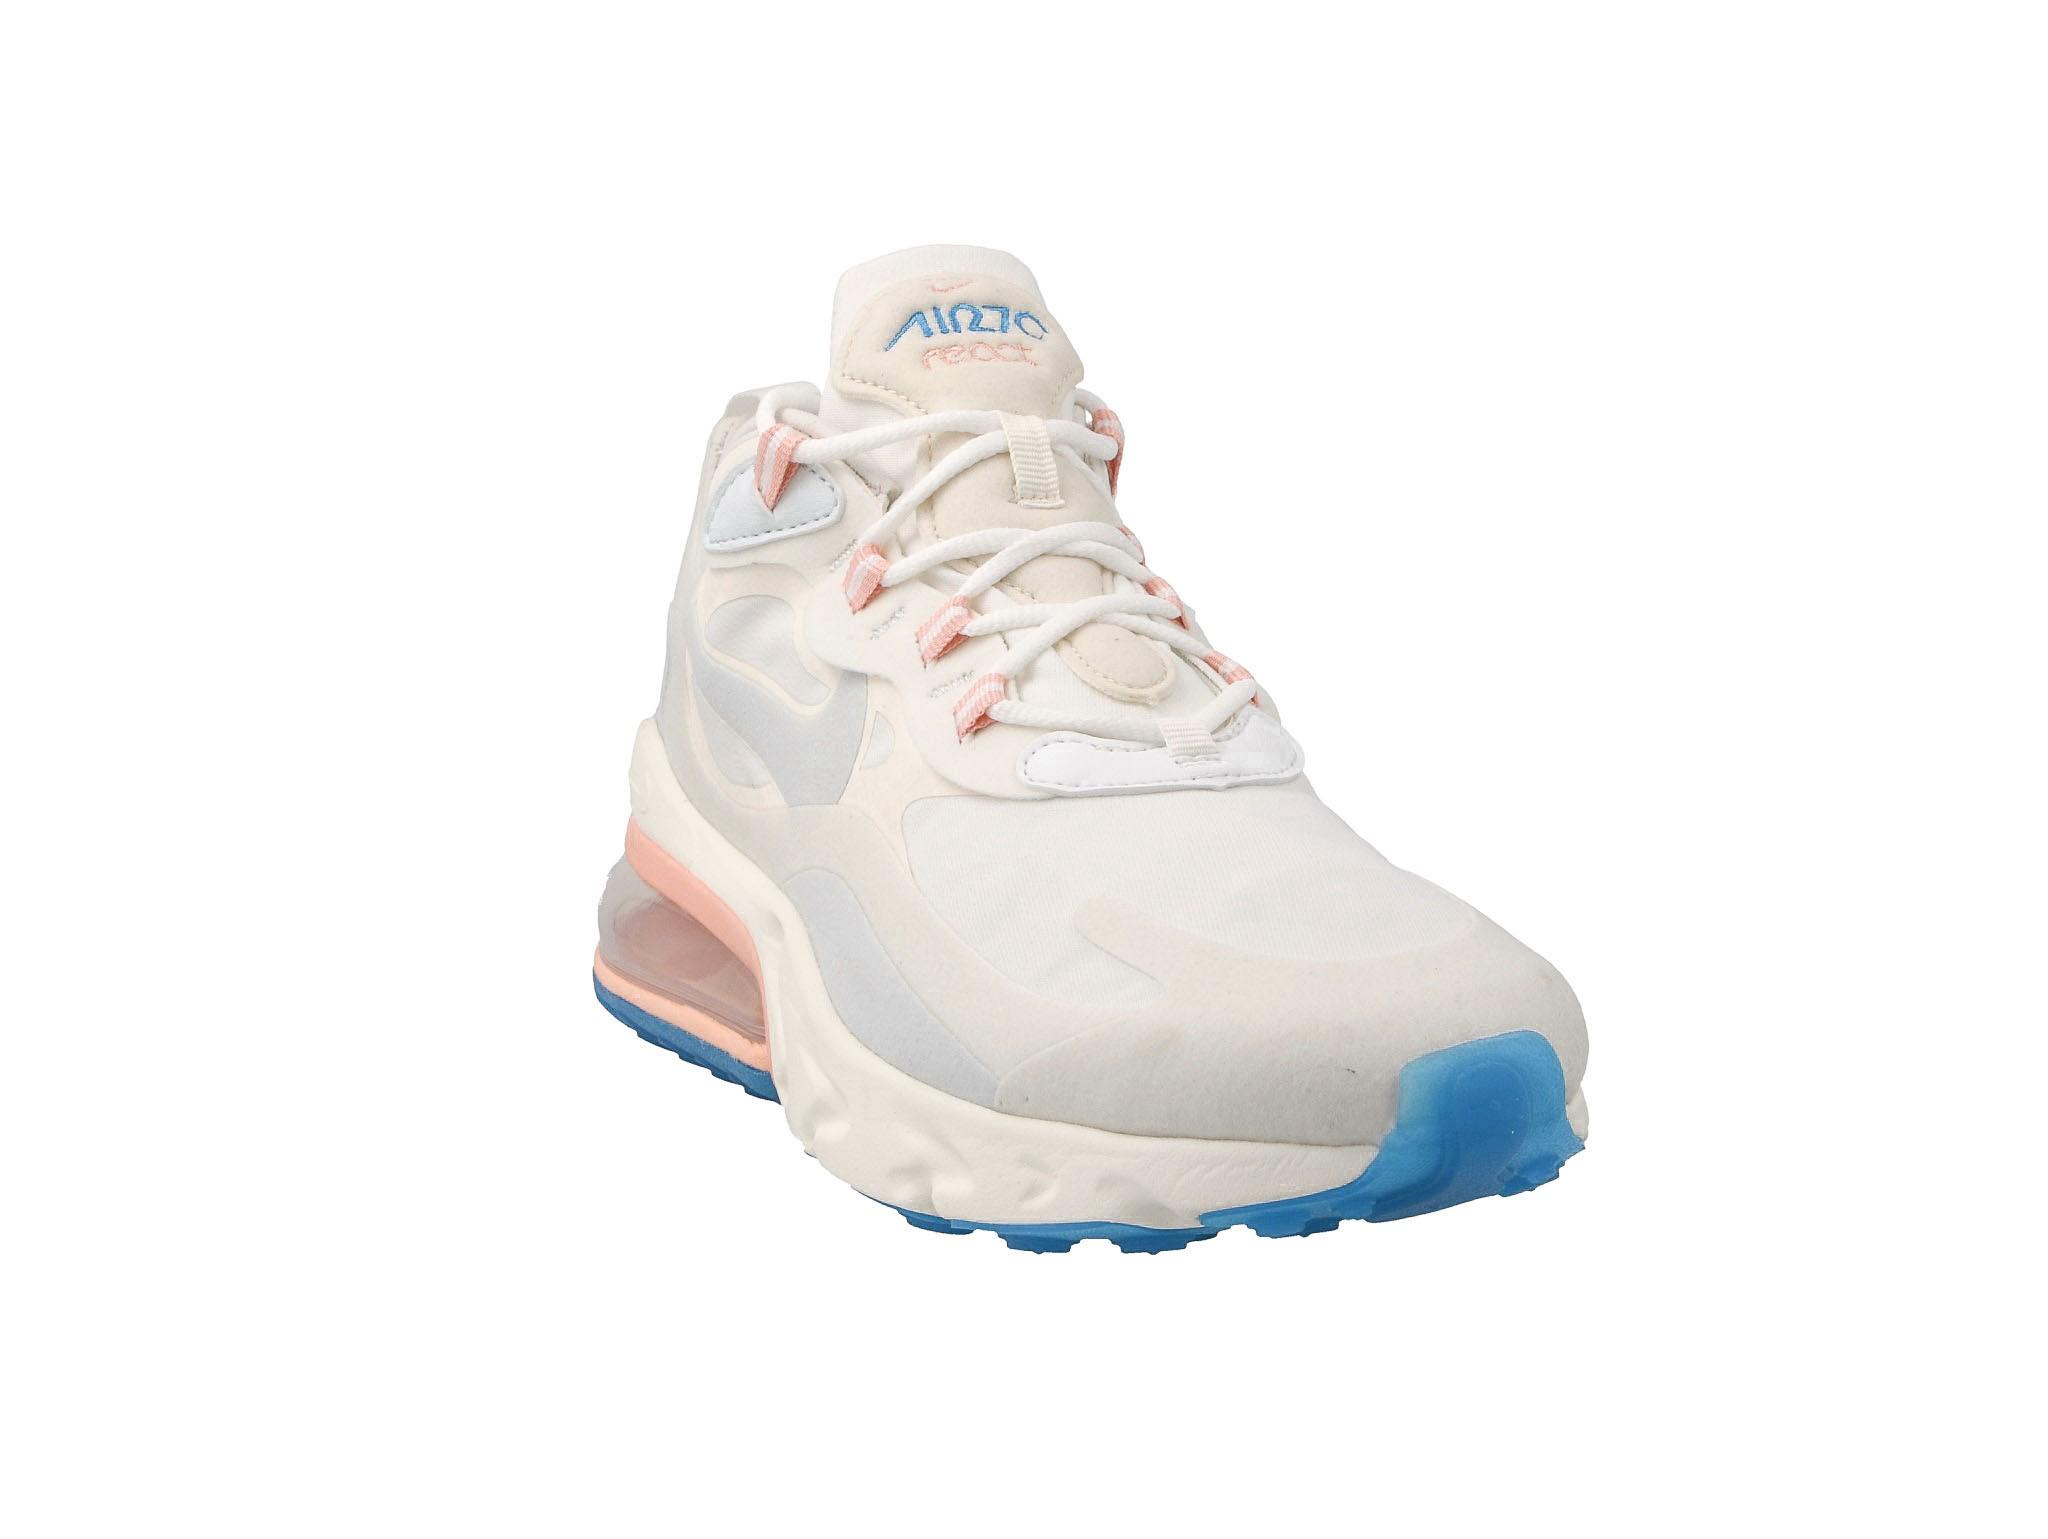 Nike Air Max 270 React Męskie Białe (AO4971 100)